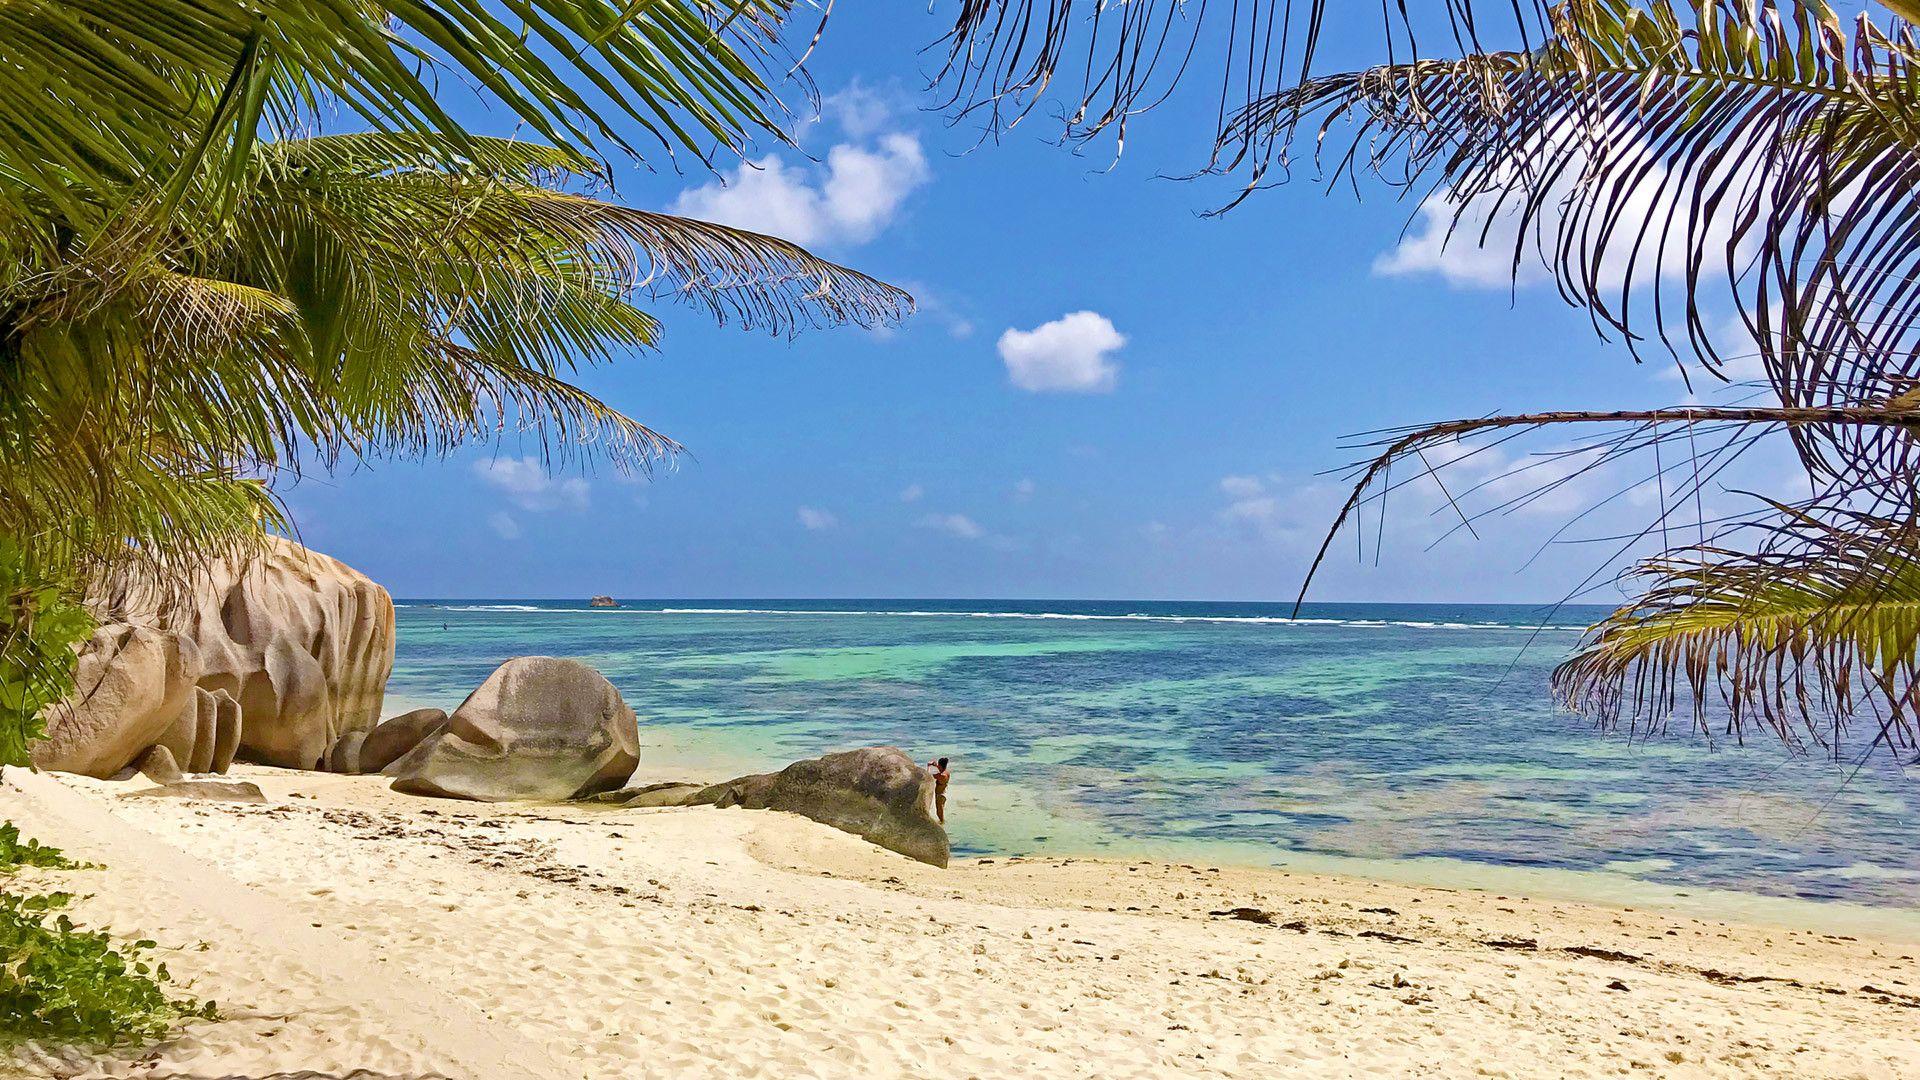 Sejur plaja Insulele Mahe & Praslin, Seychelles, 10 zile